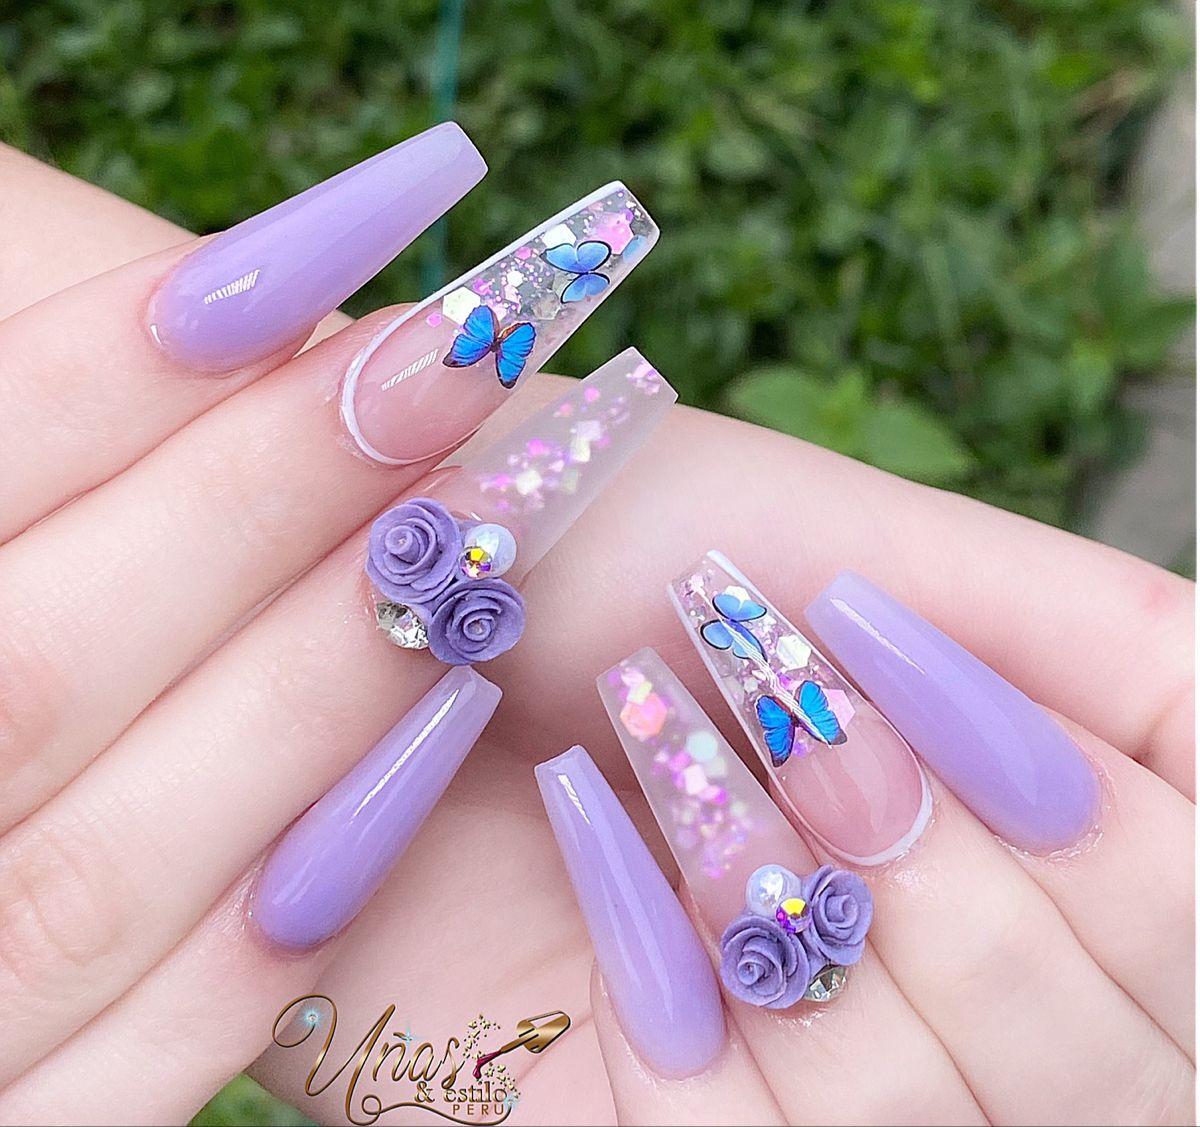 #butterfly #butterflynails #nails #nailsofinstagram #nailstagram #nailsdesign